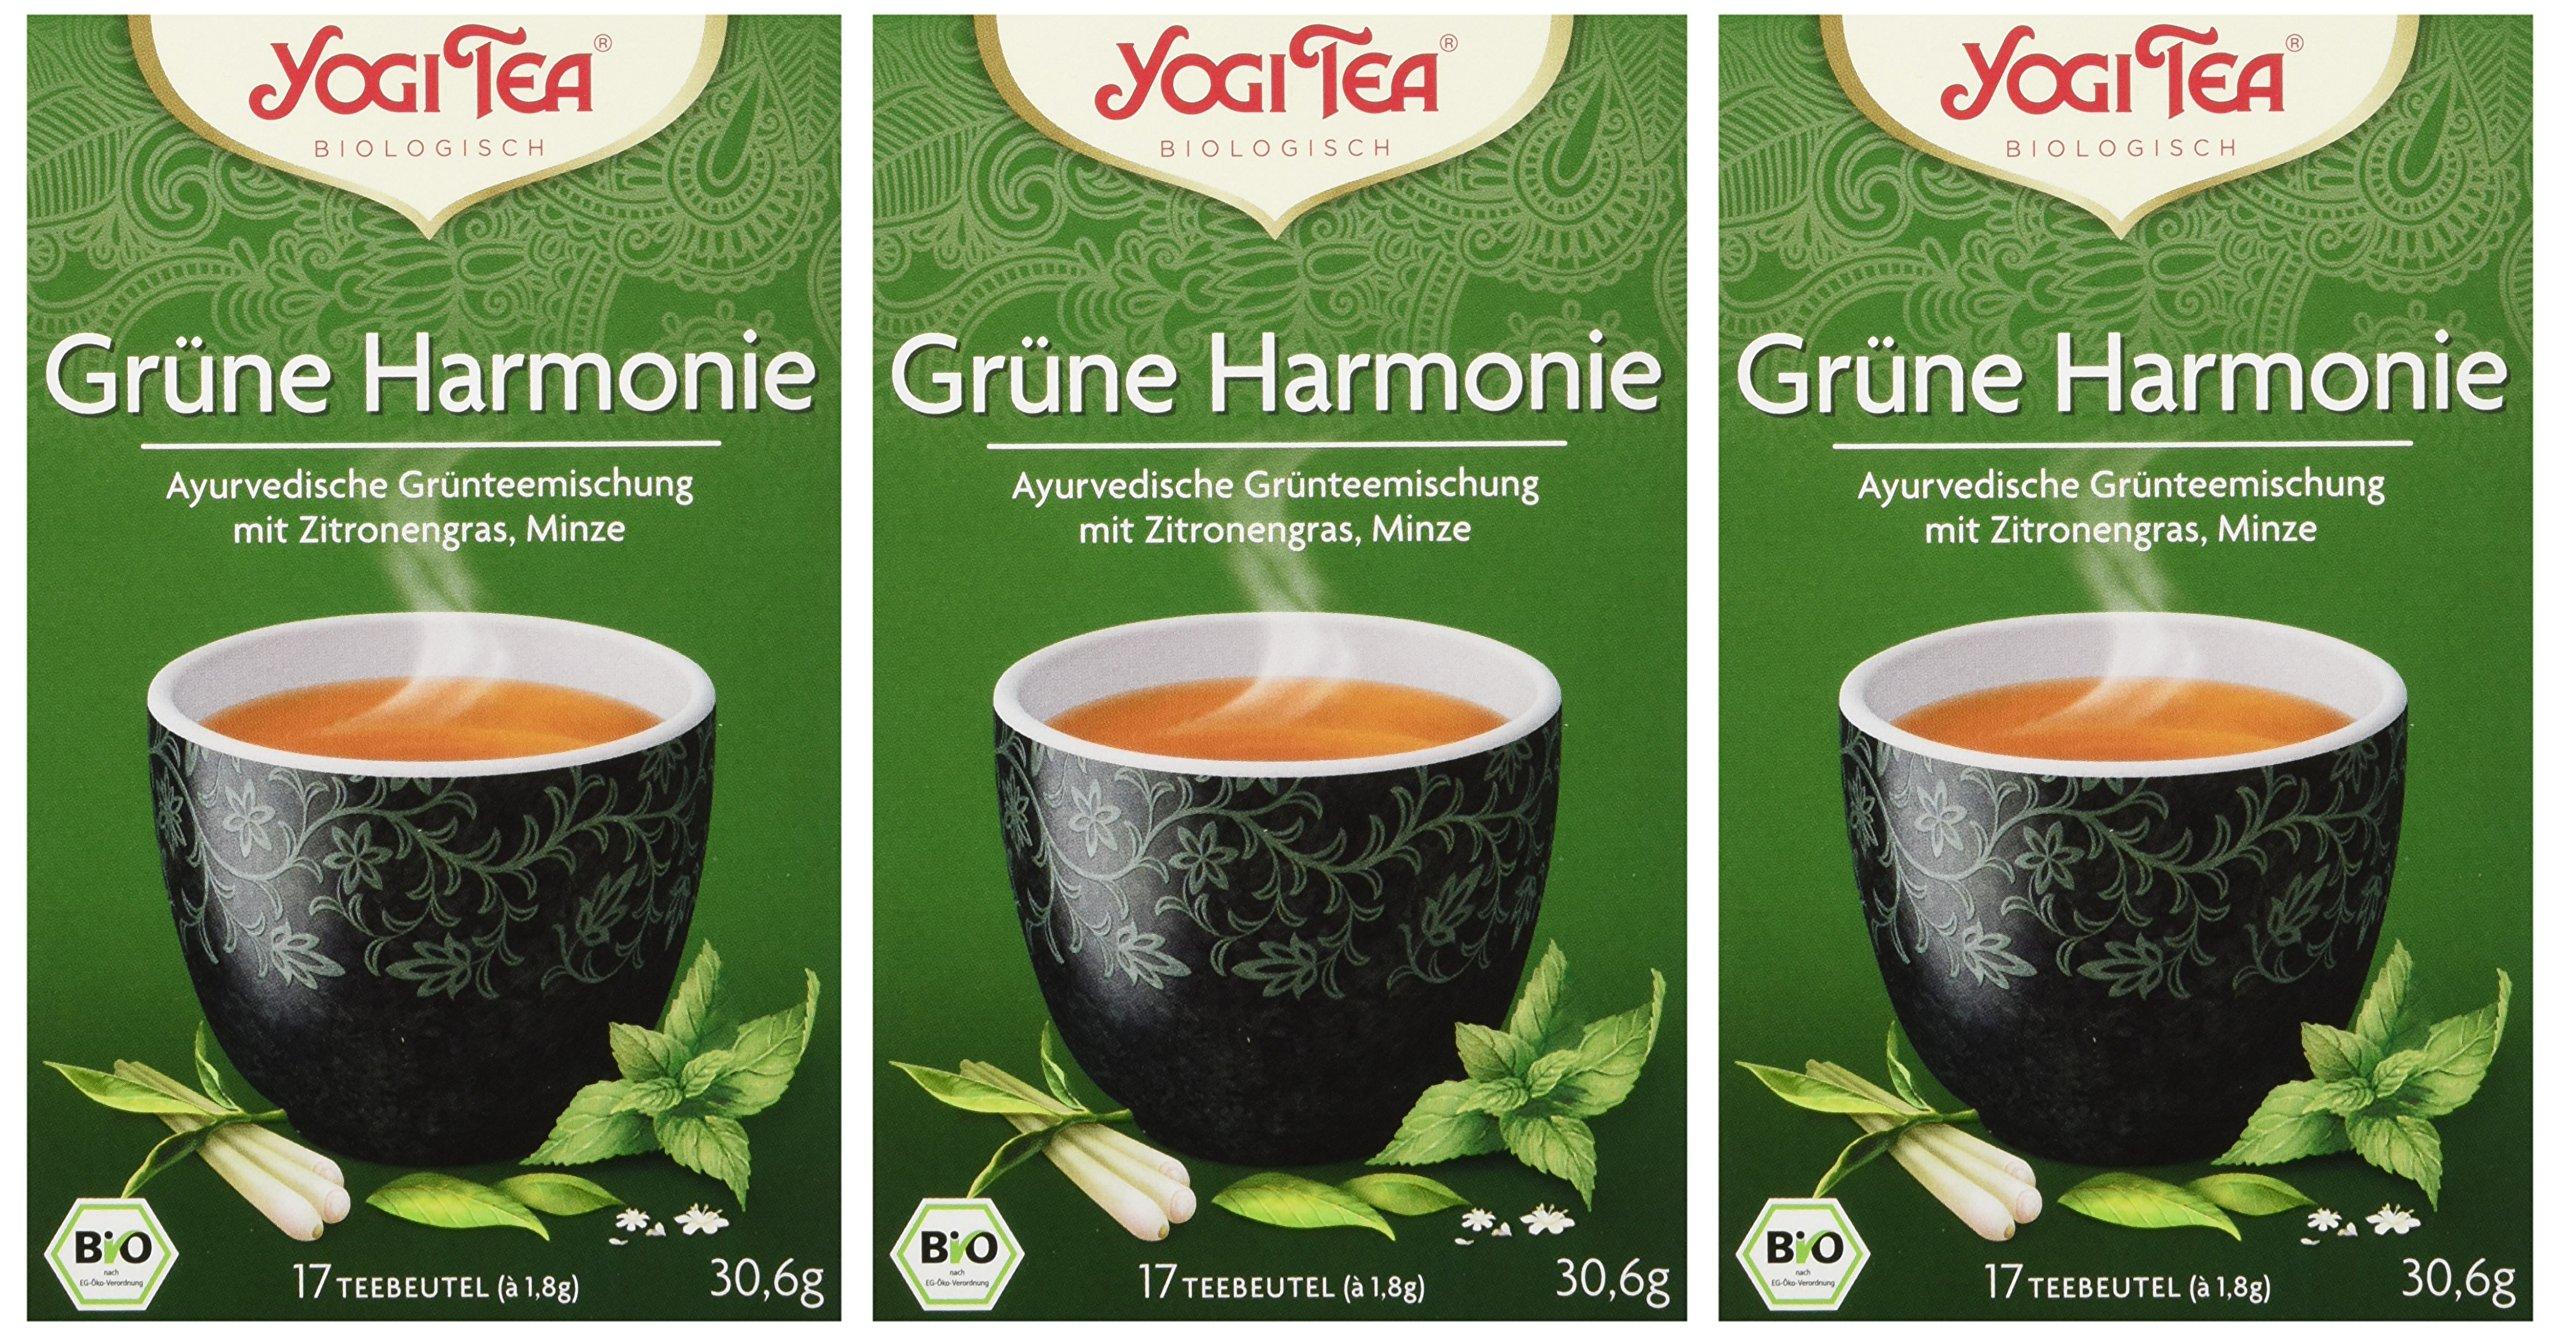 Yogi-Tea-Grne-Harmonie-Bio-3er-Pack-3-x-306-g